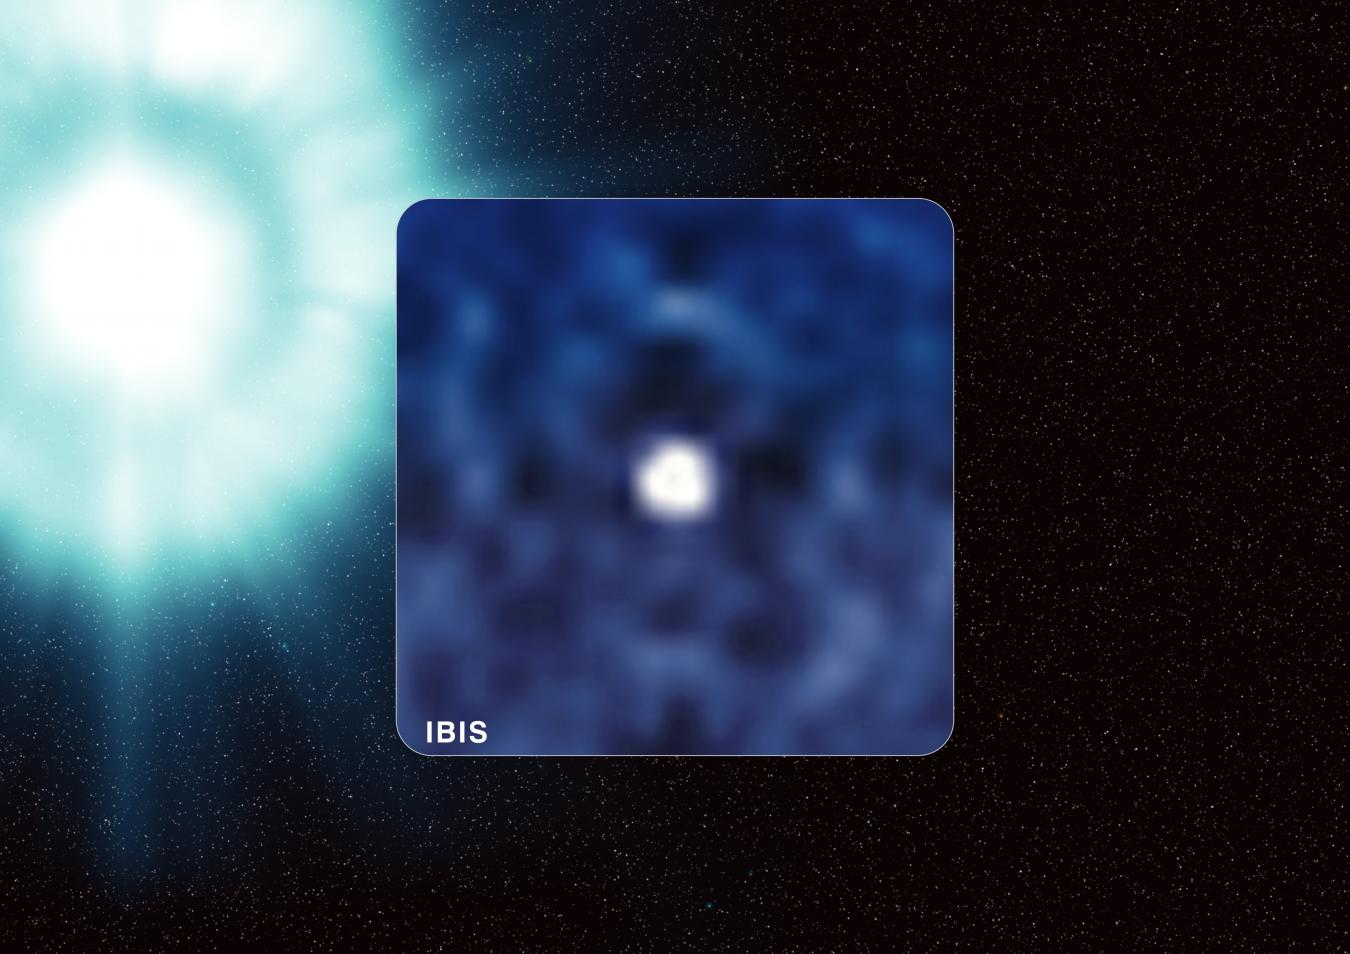 Le satellite Integral teste la relativité